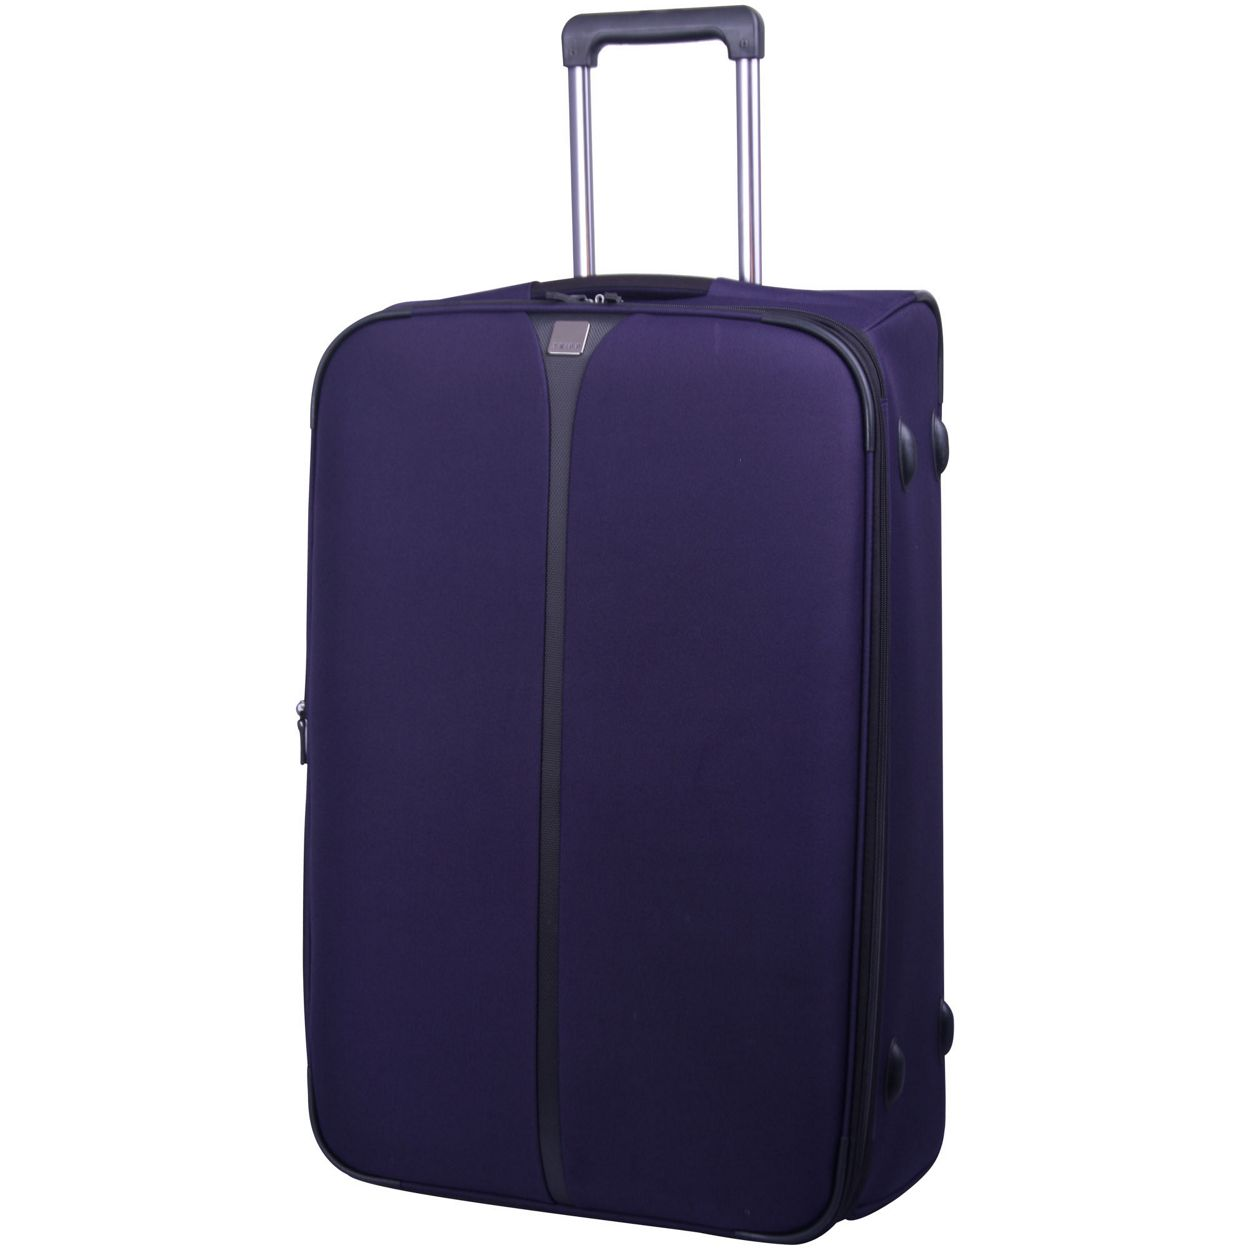 Tripp Grape 'Superlite III' 2 wheel large suitcase | Debenhams